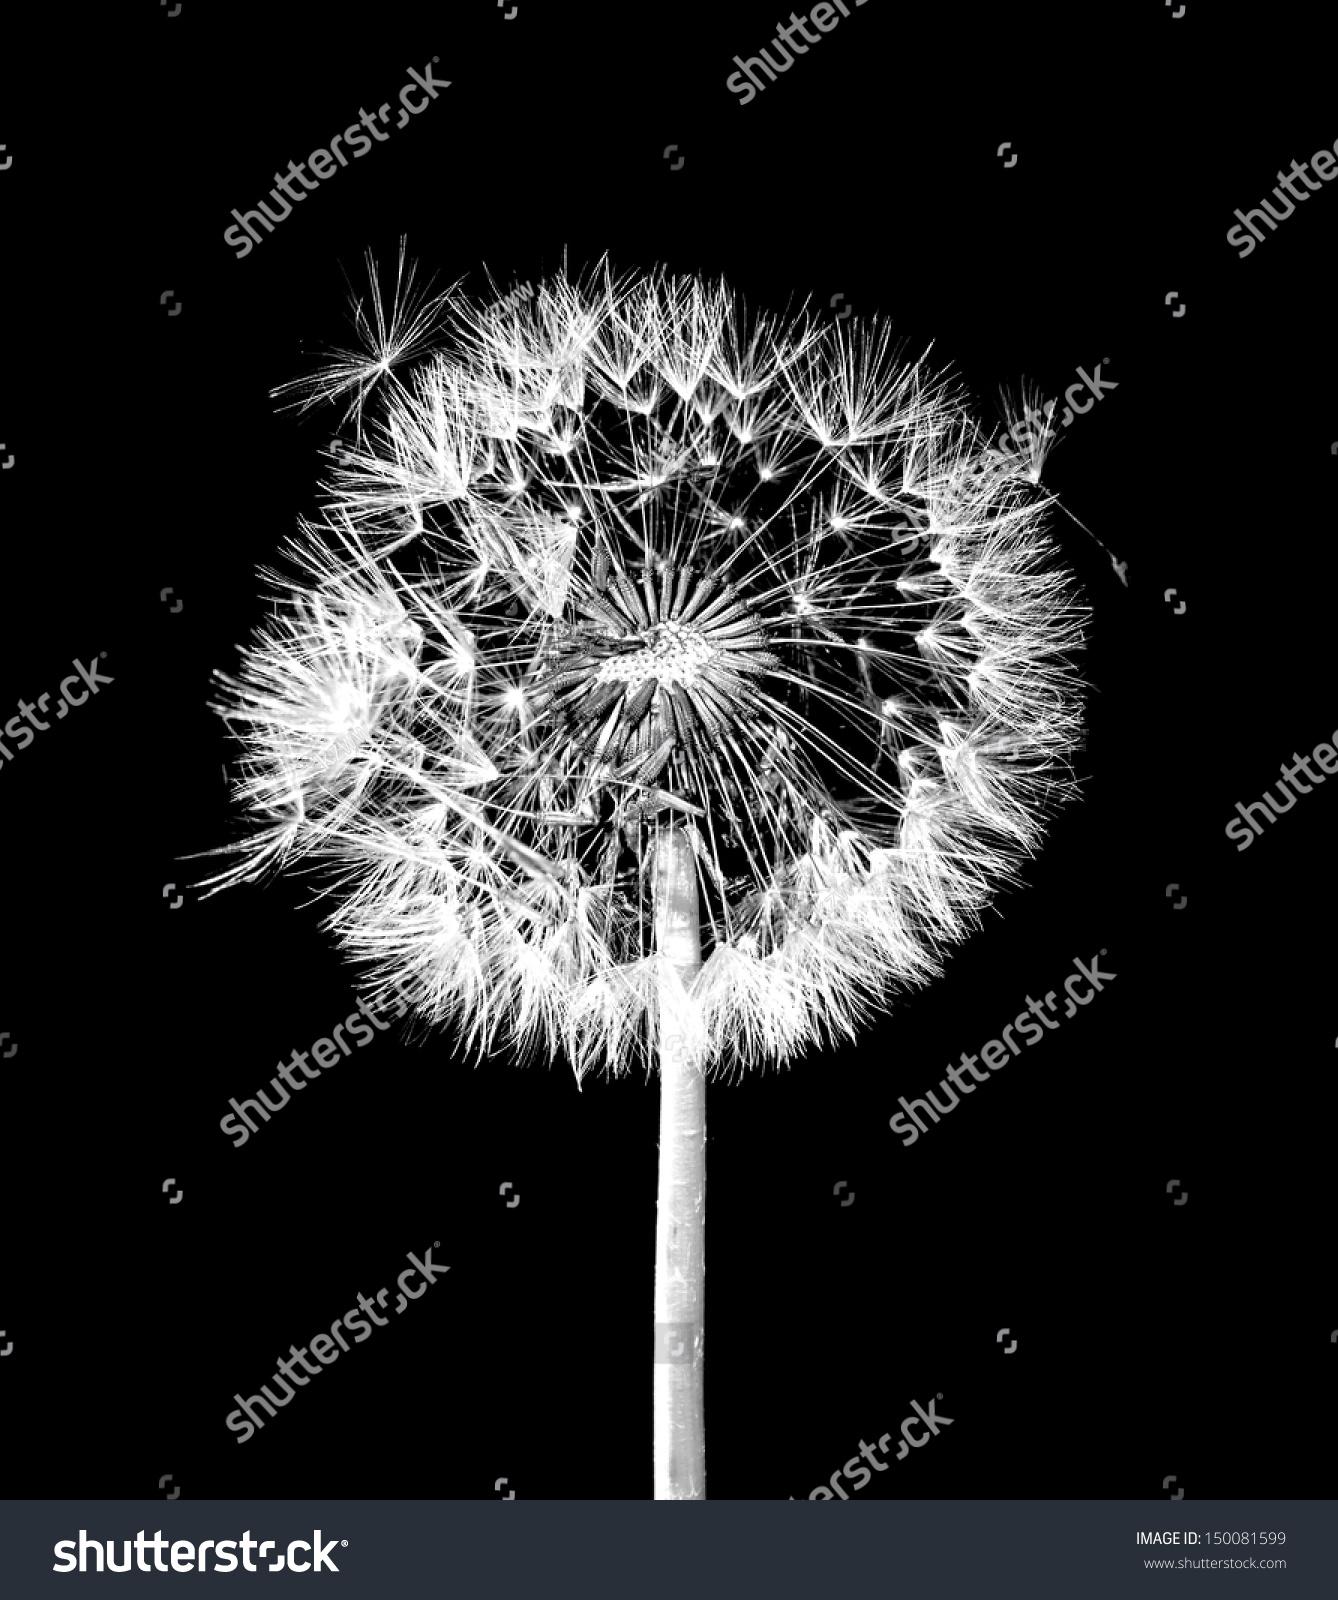 Dandelion flower on black background #150081599